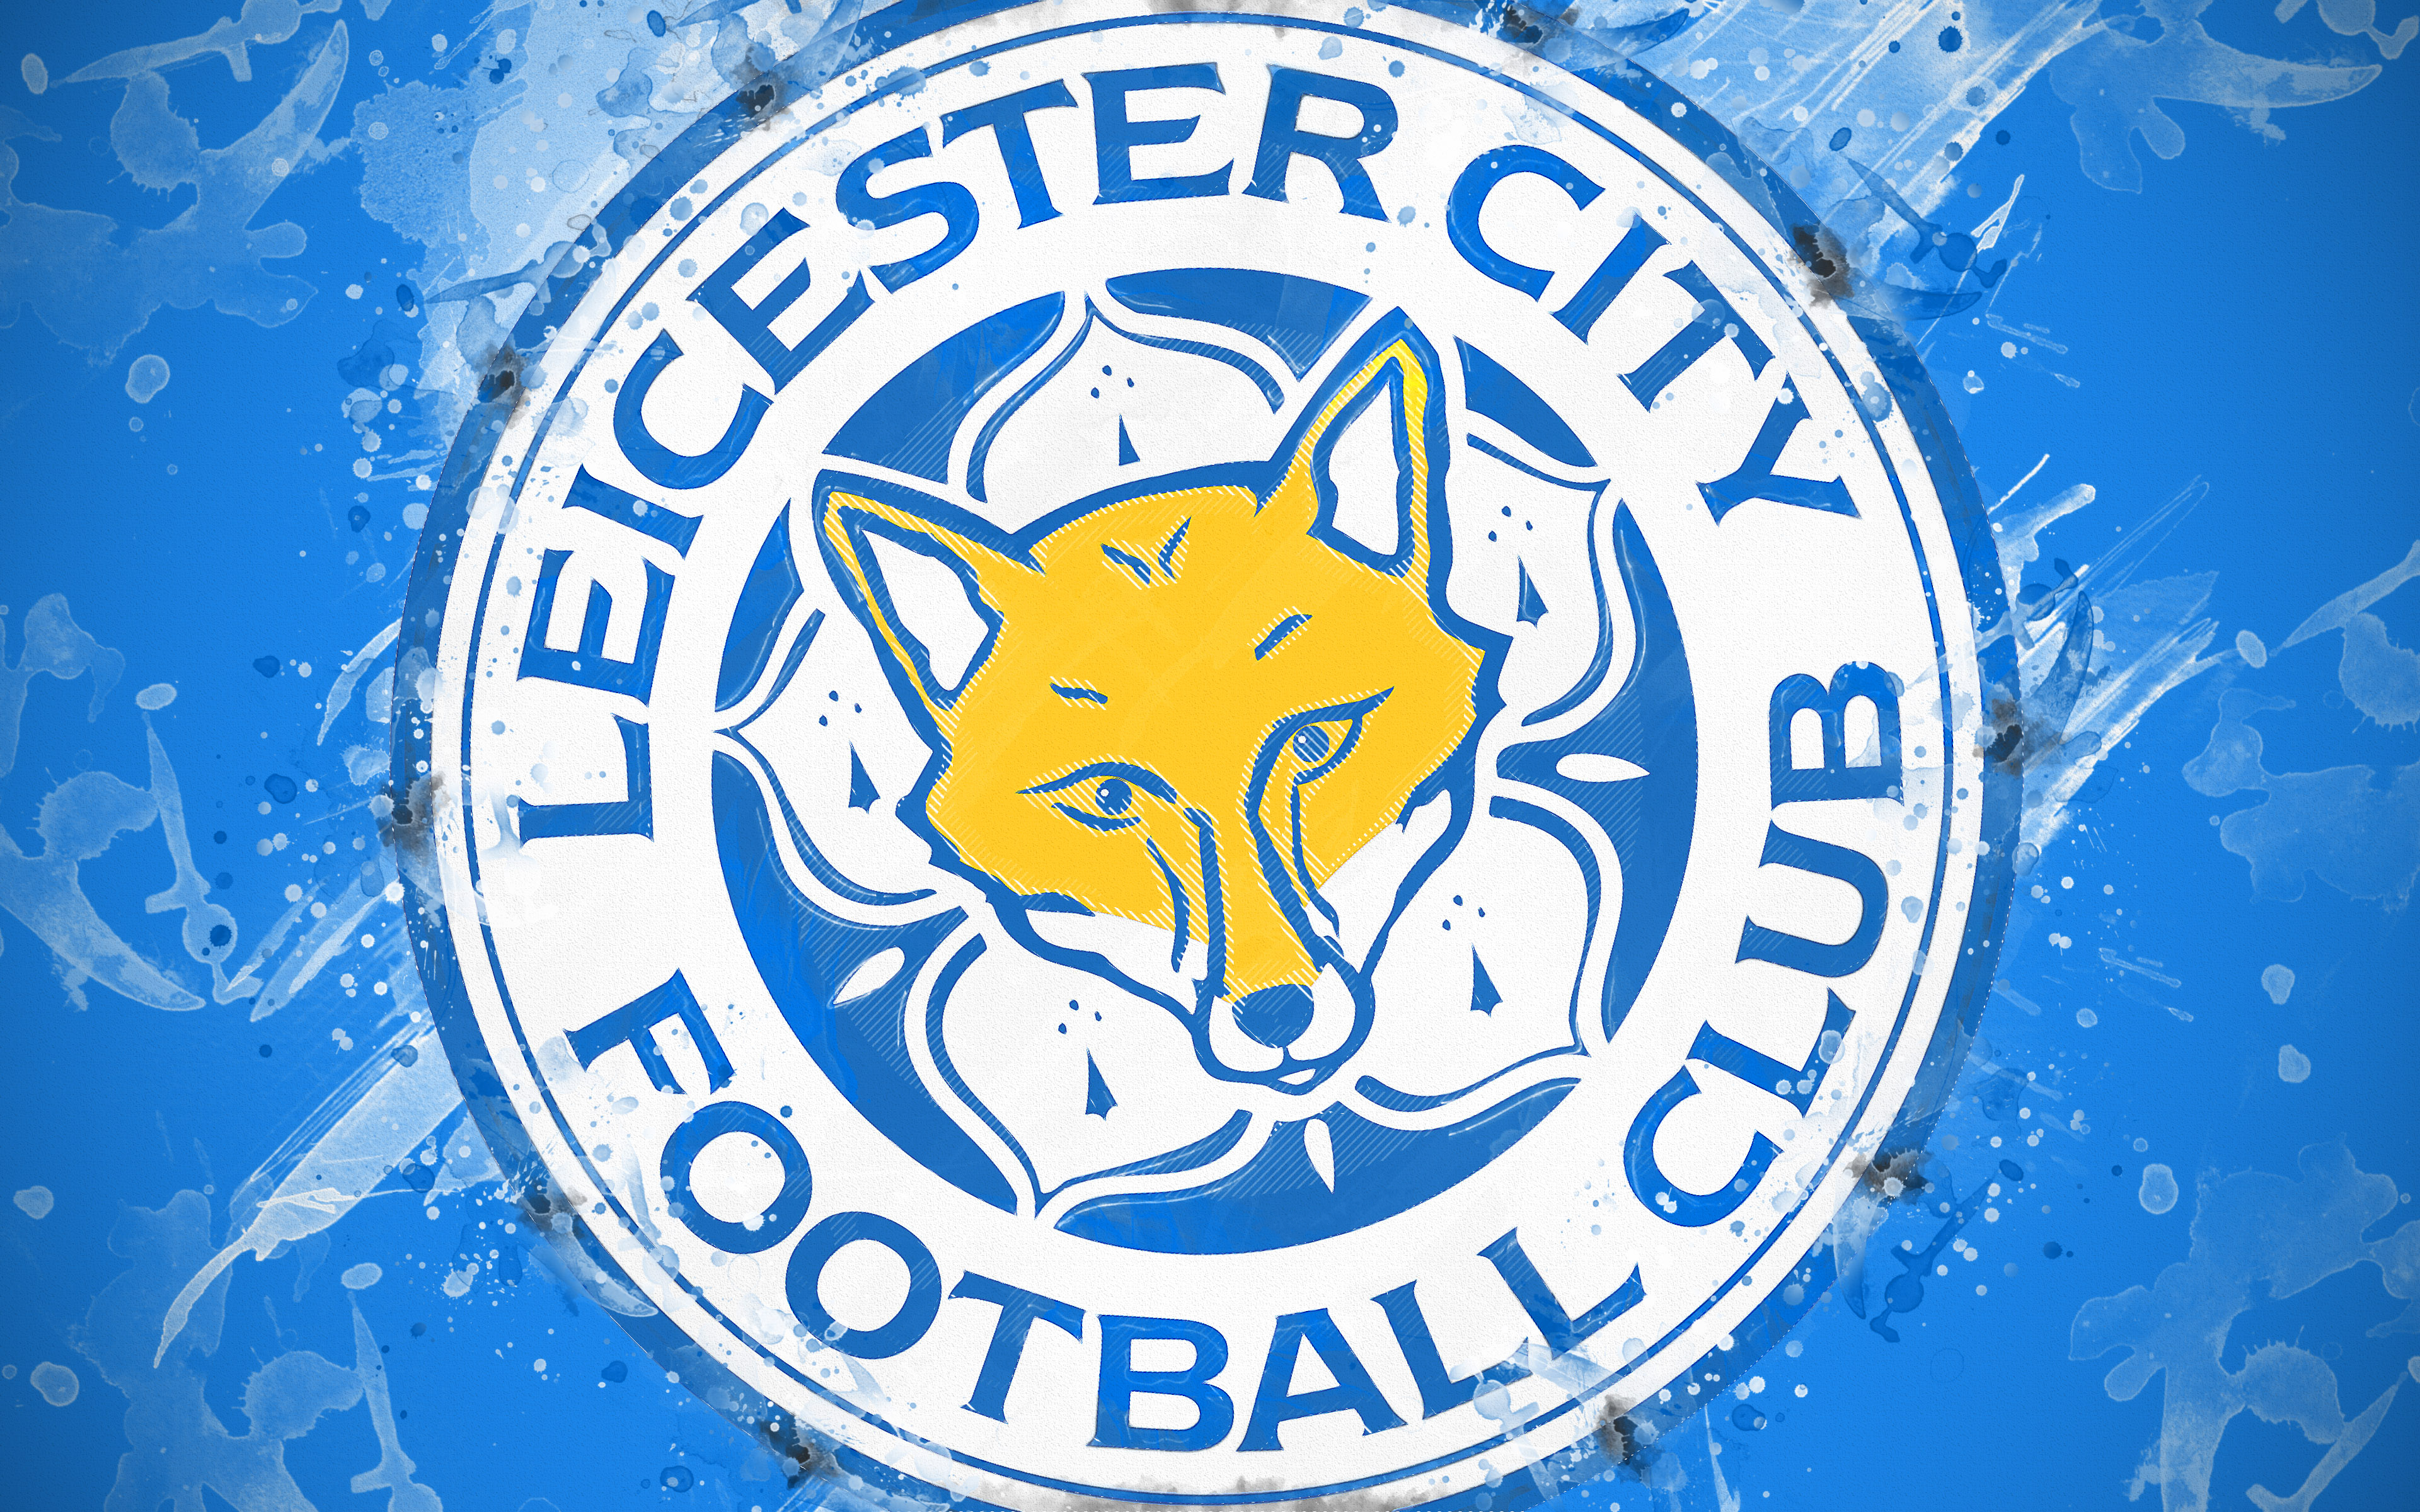 Emblem Leicester City F C Logo Soccer Wallpaper Resolution 3840x2400 Id 1147992 Wallha Com